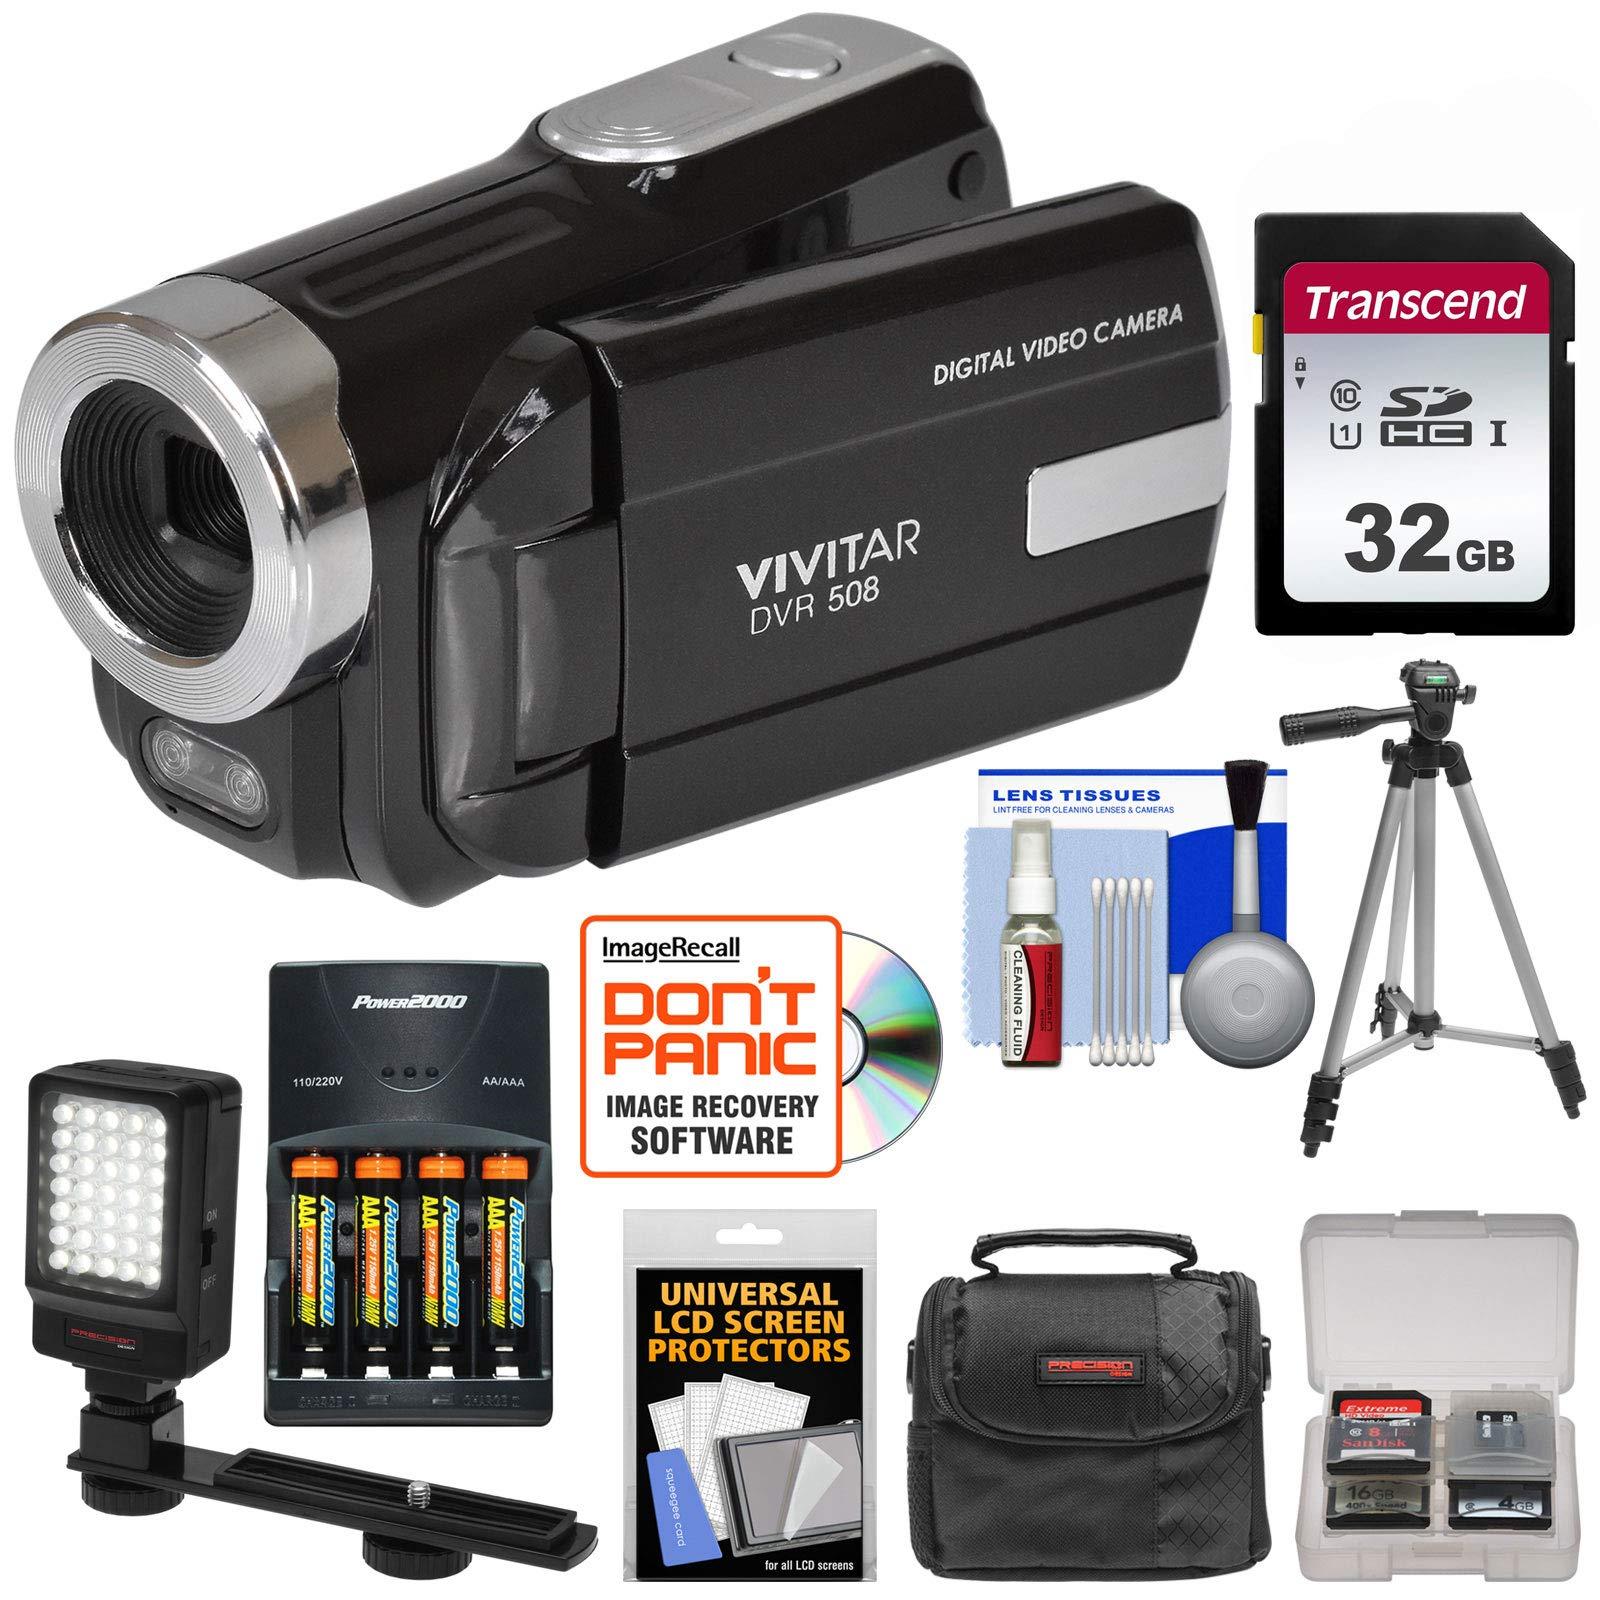 Vivitar DVR-508 HD Digital Video Camera Camcorder (Black) with 32GB Card + Batteries & Charger + Case + LED Video Light + Tripod + Kit